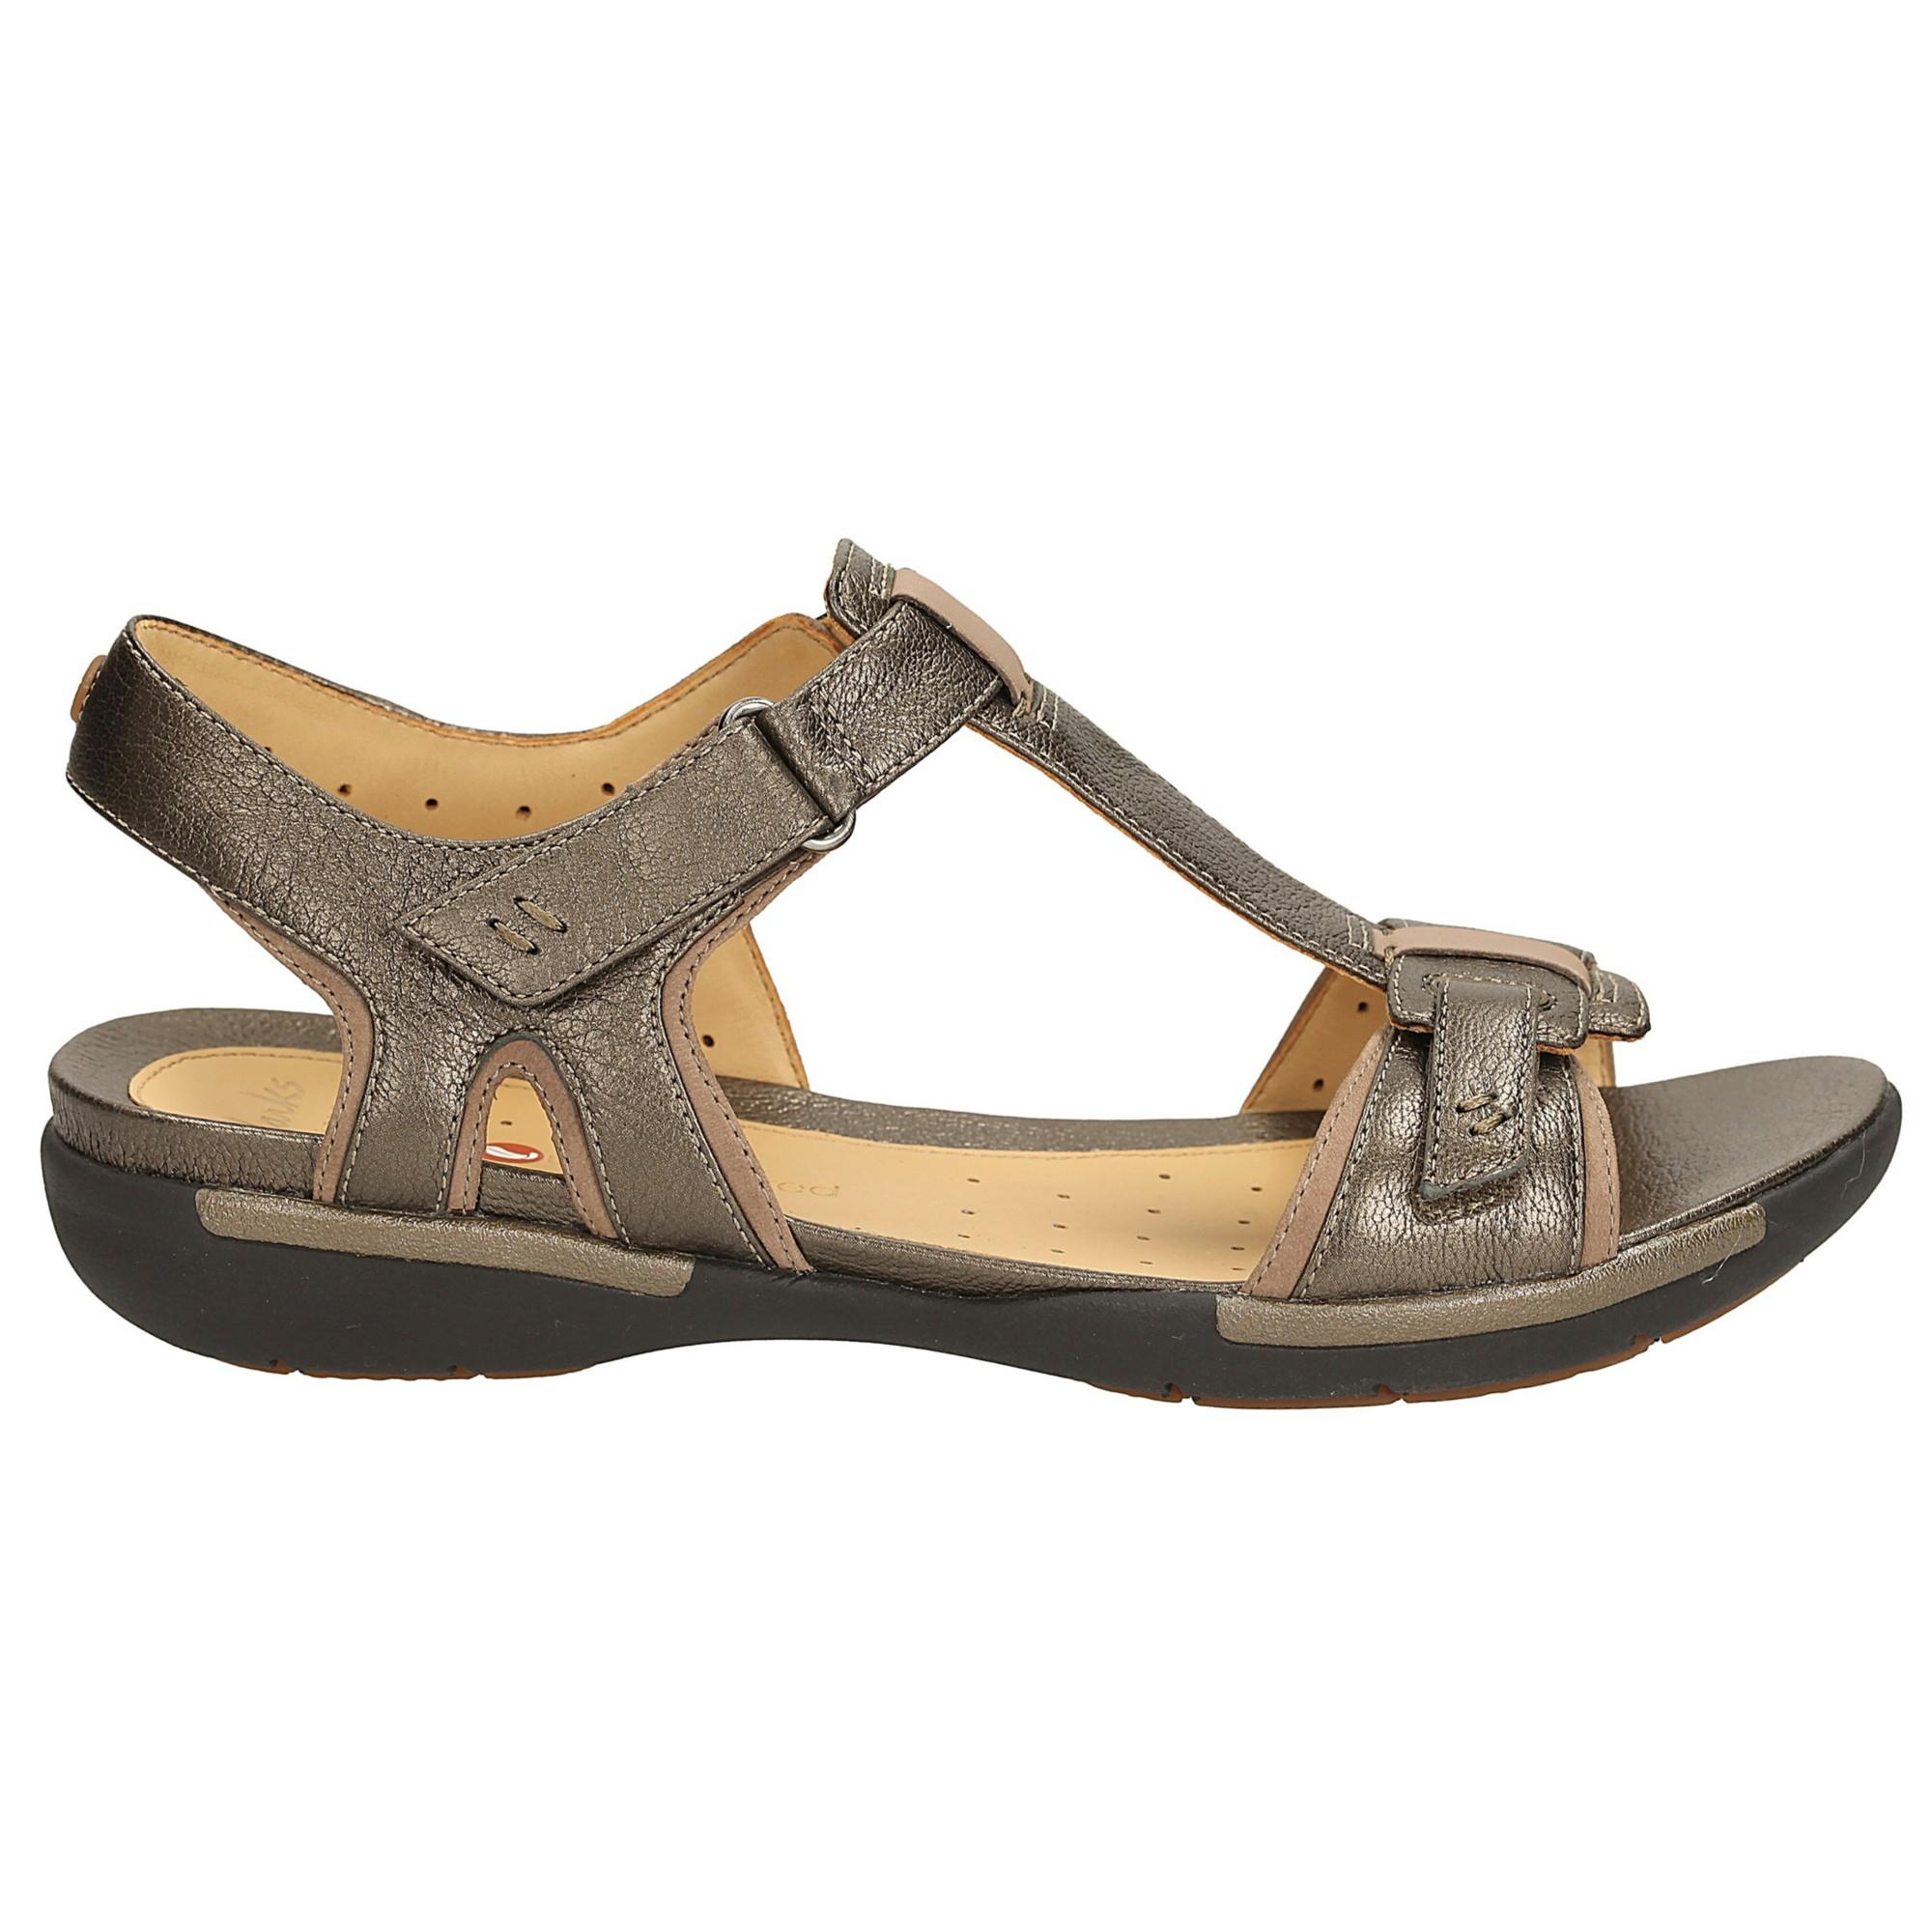 4d1f84950b5af8 Clarks Un Voshell Leather Sandals in Metallic - Lyst